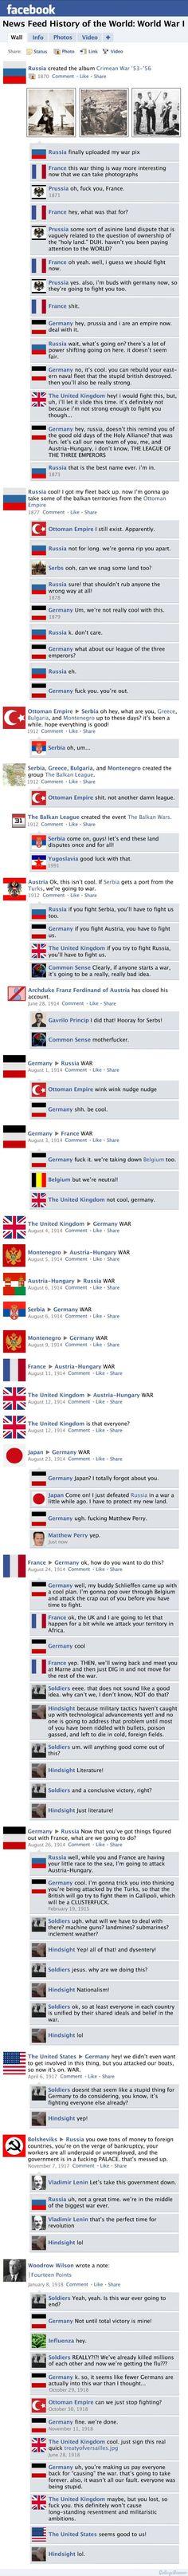 Facebook News Feed History of the World: World War I to World War II - CollegeHumor Article